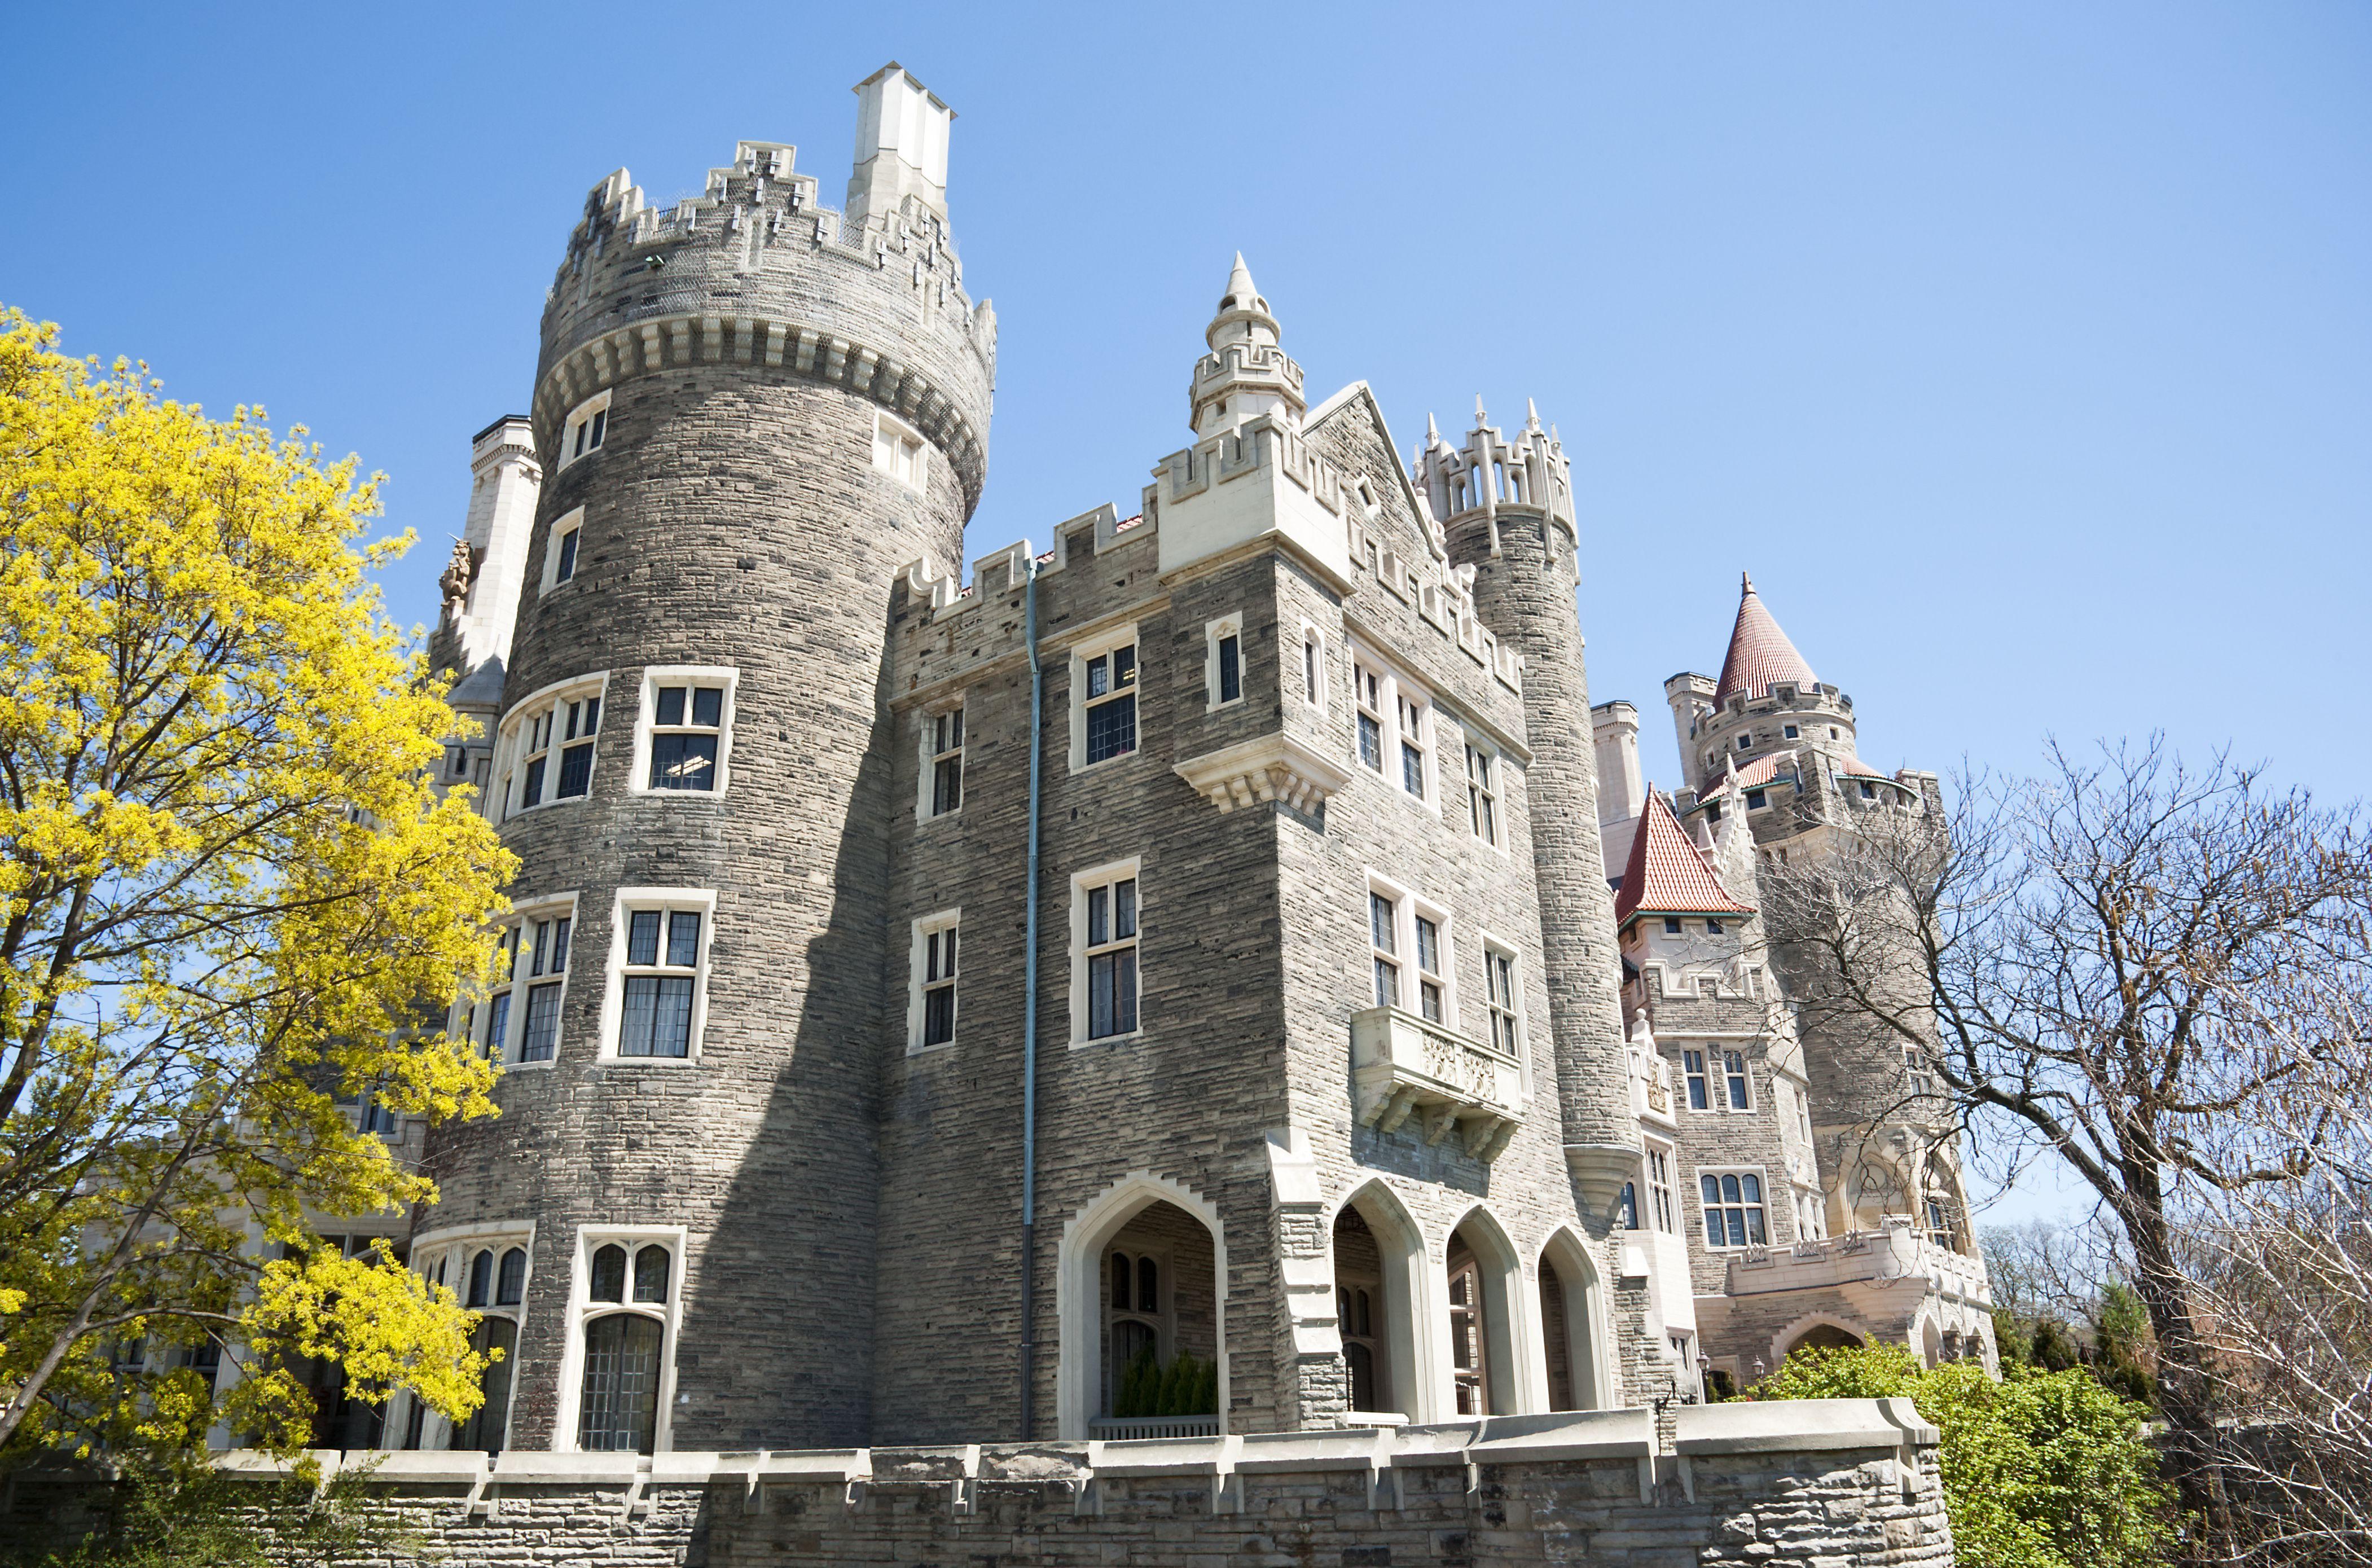 First Choice Auto >> Casa Loma: A Historic Downtown Toronto Castle